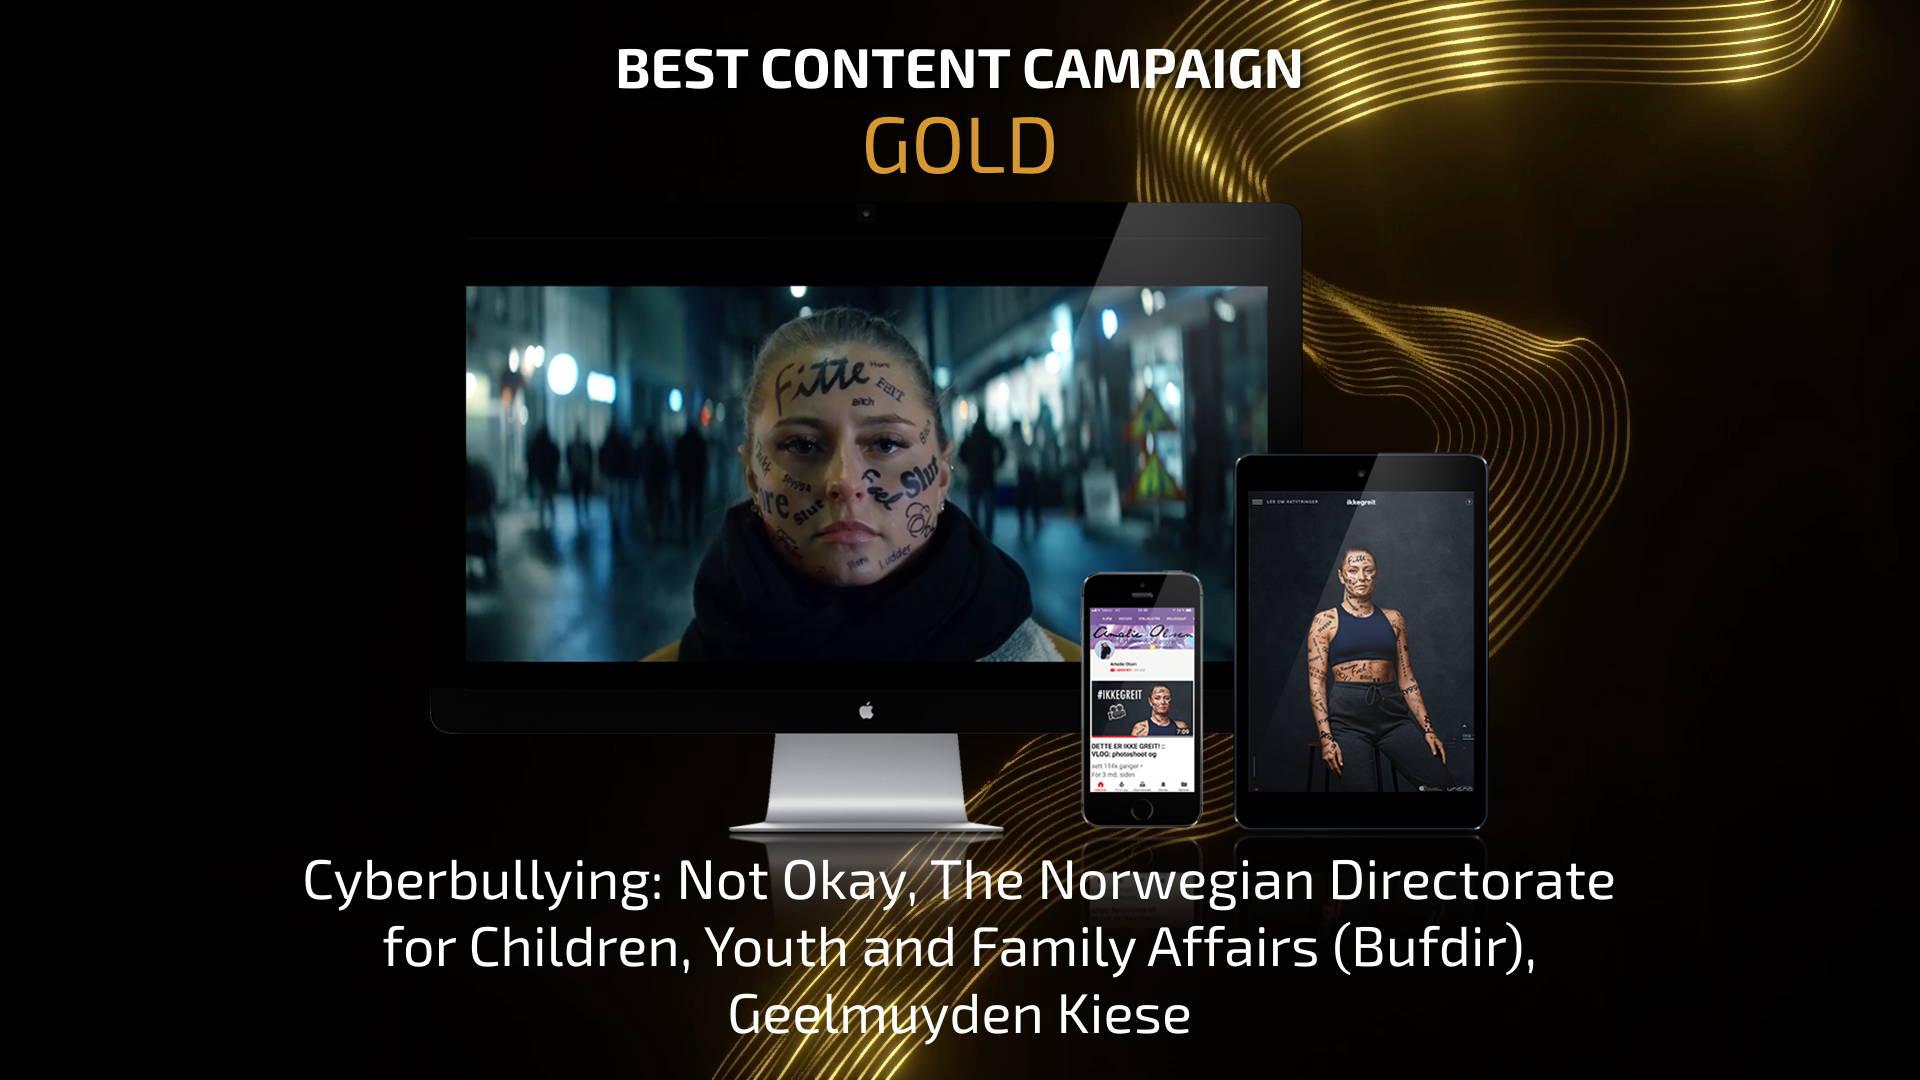 Best Content Campaign - Gold